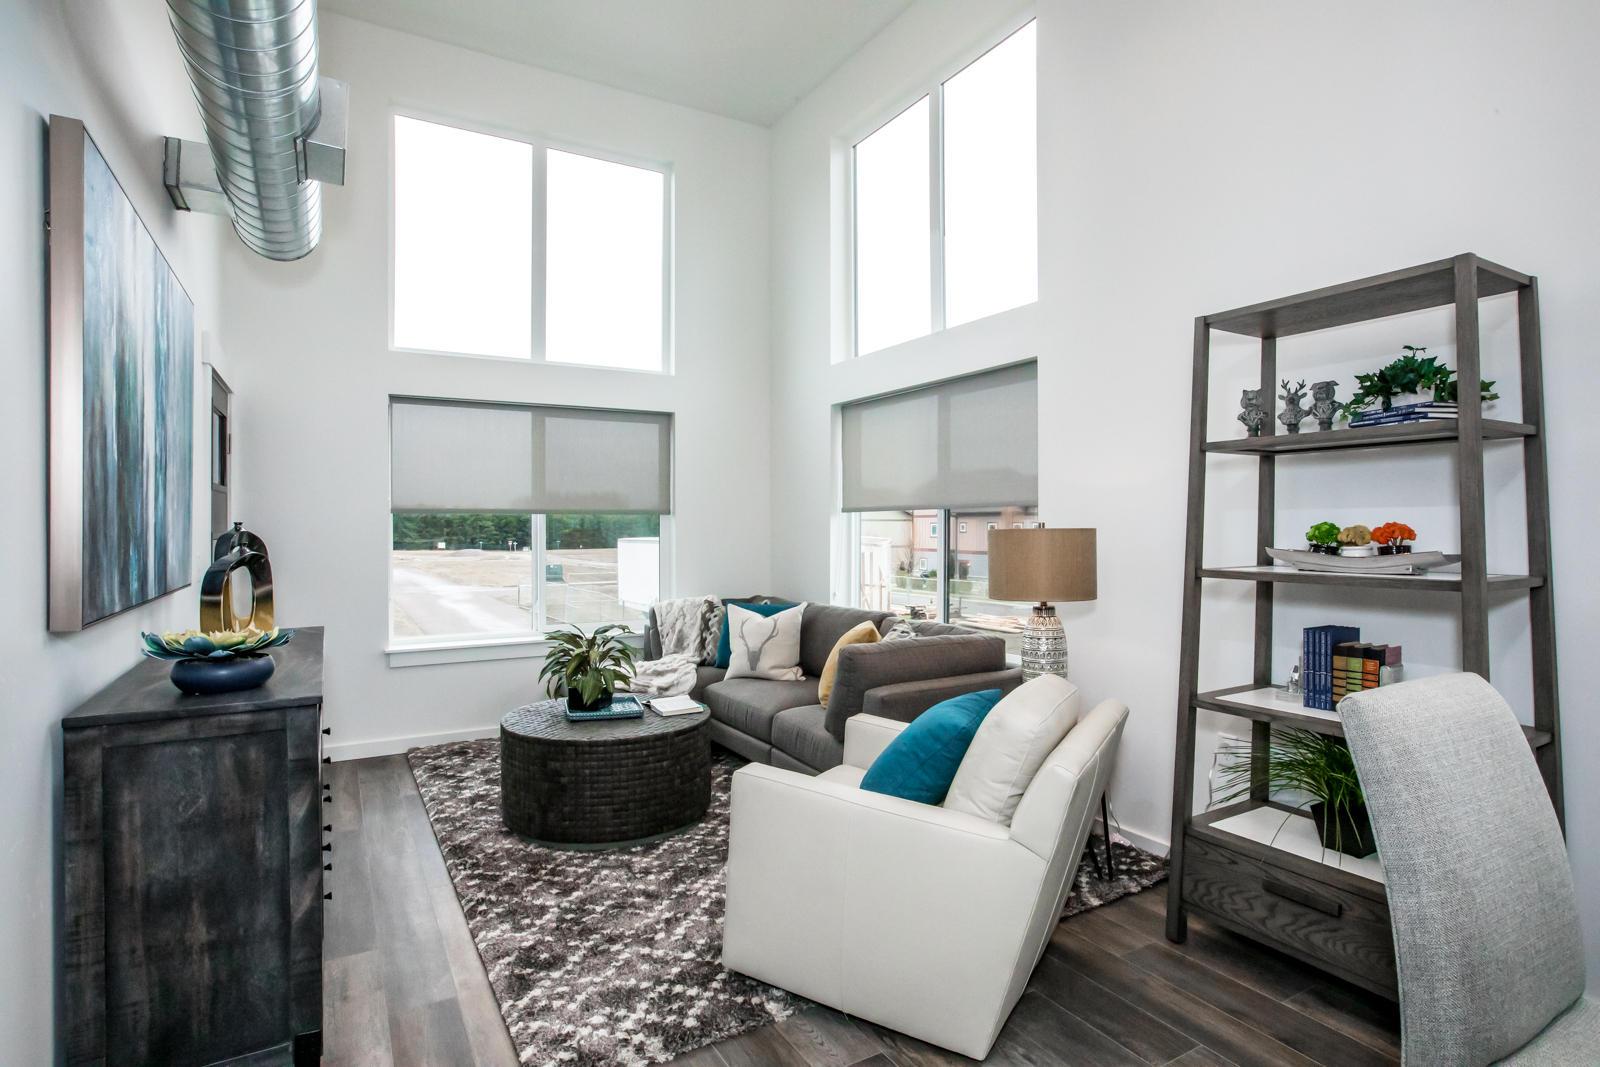 9 Living Room